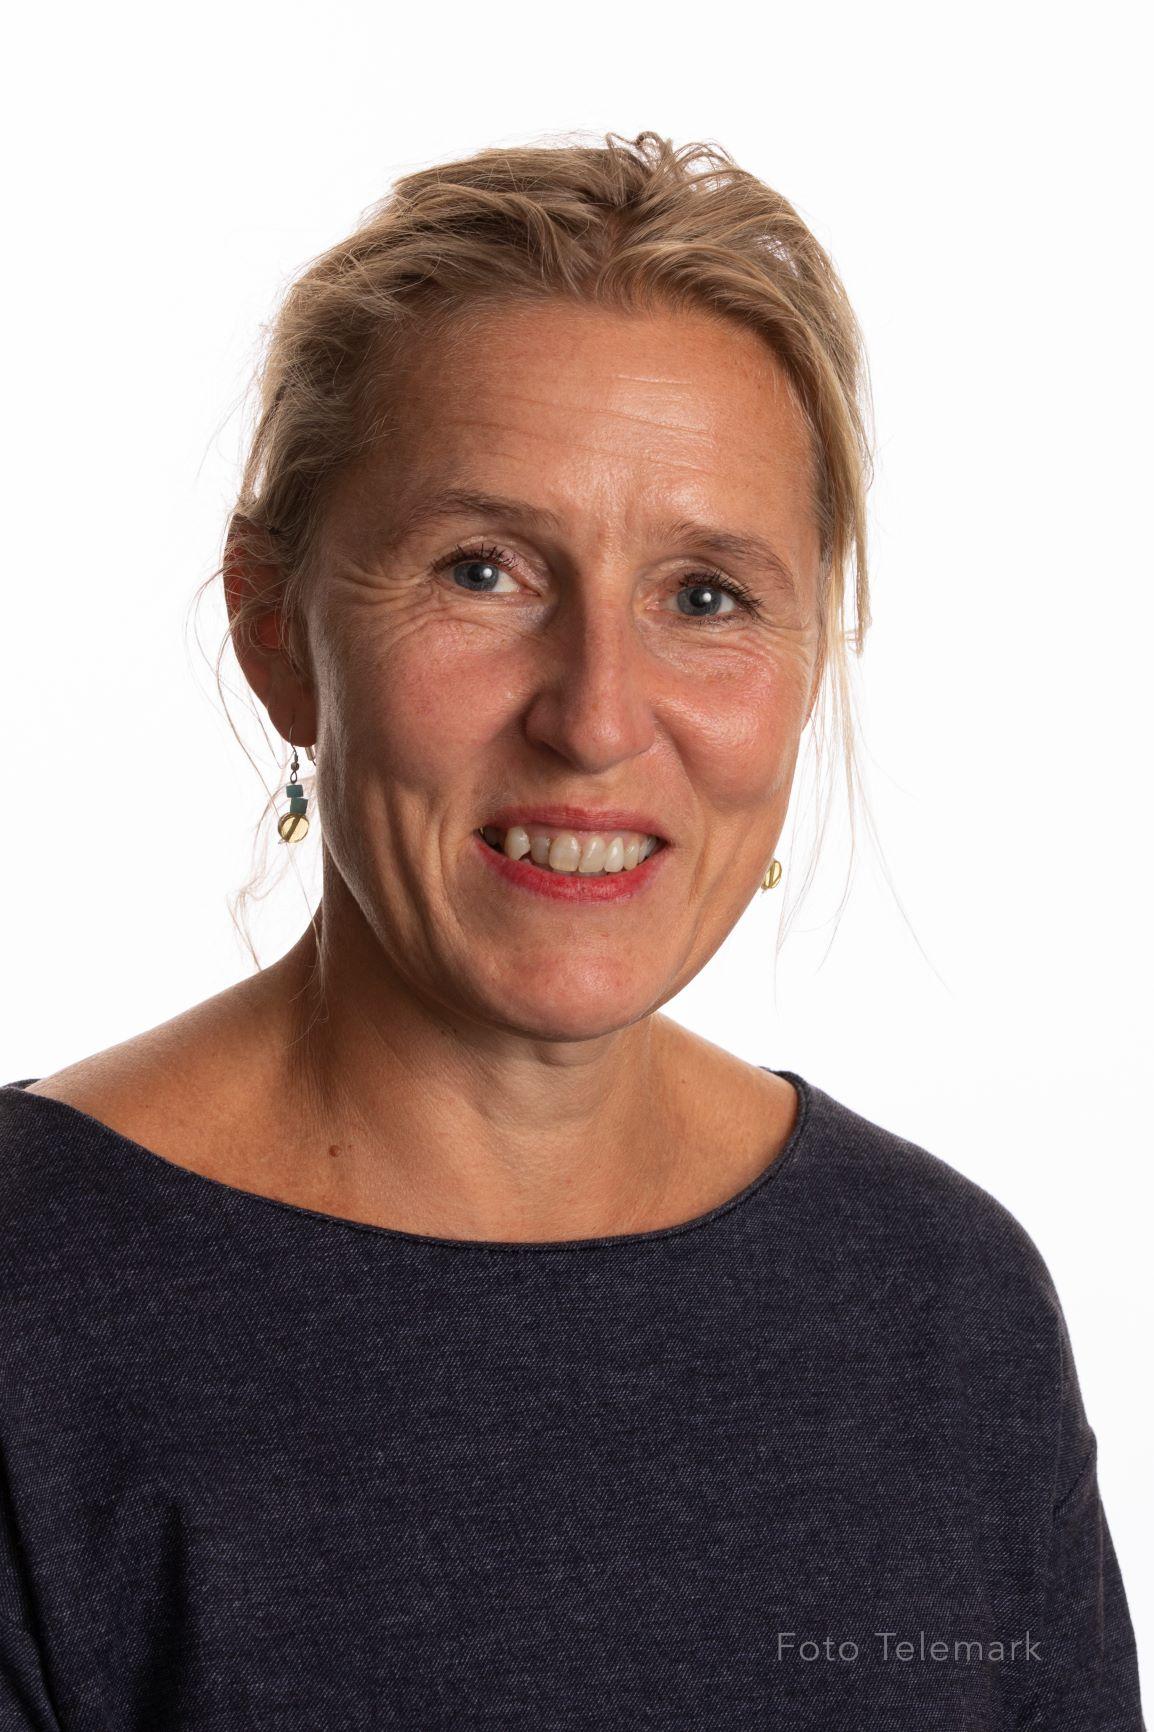 Anne-Sofie Hjemdahl